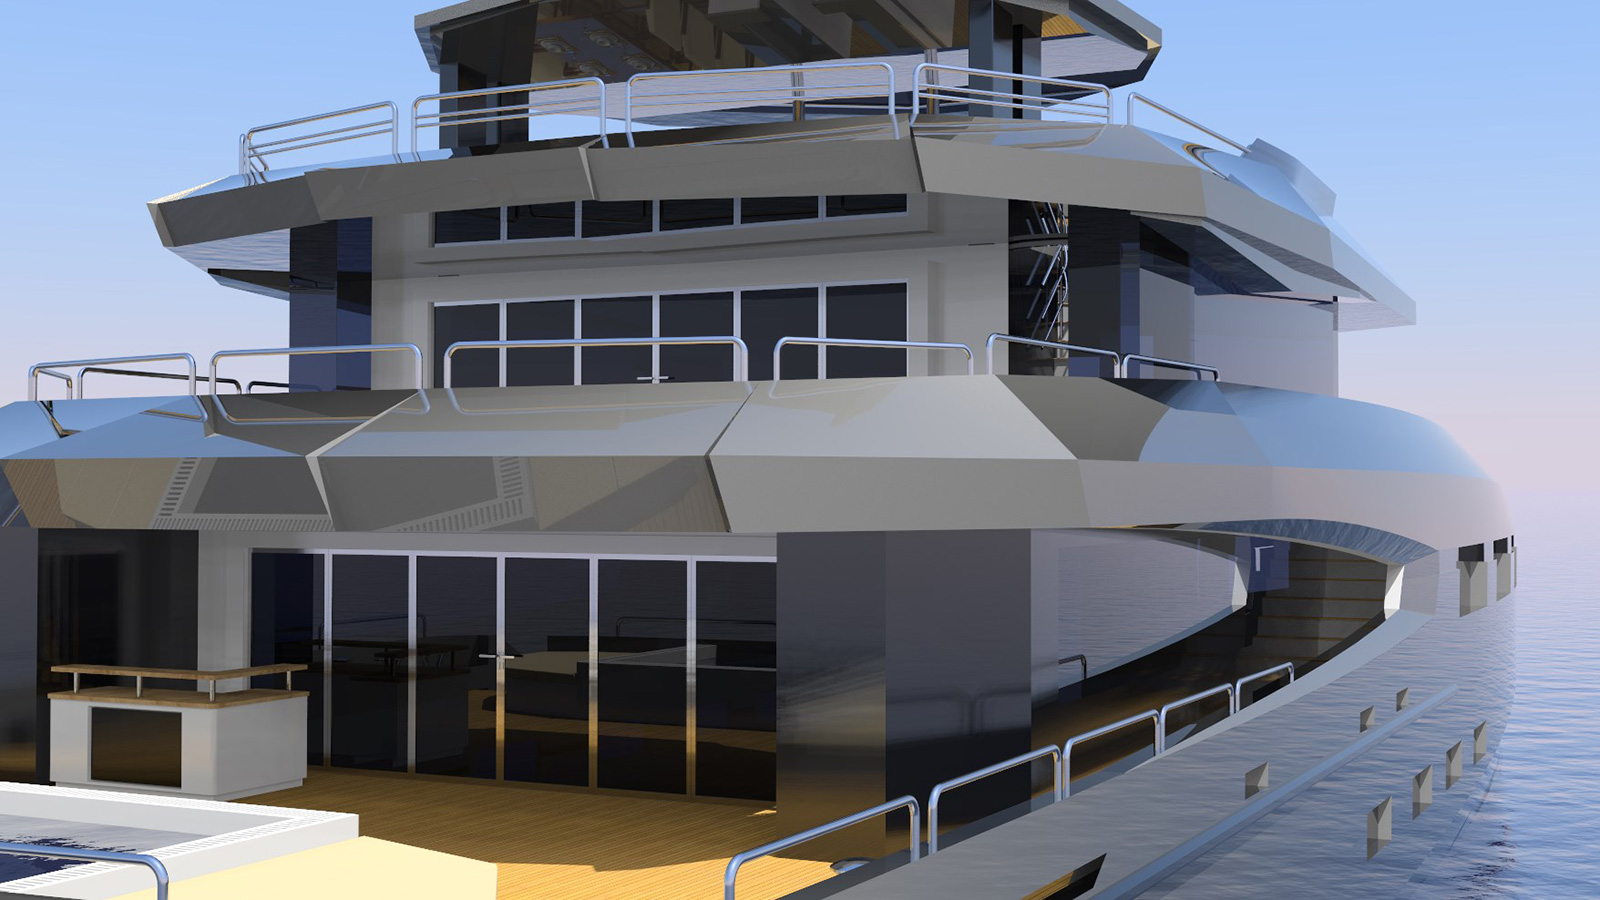 the-aft-deck-of-the-heysea-135-vista-catamaran